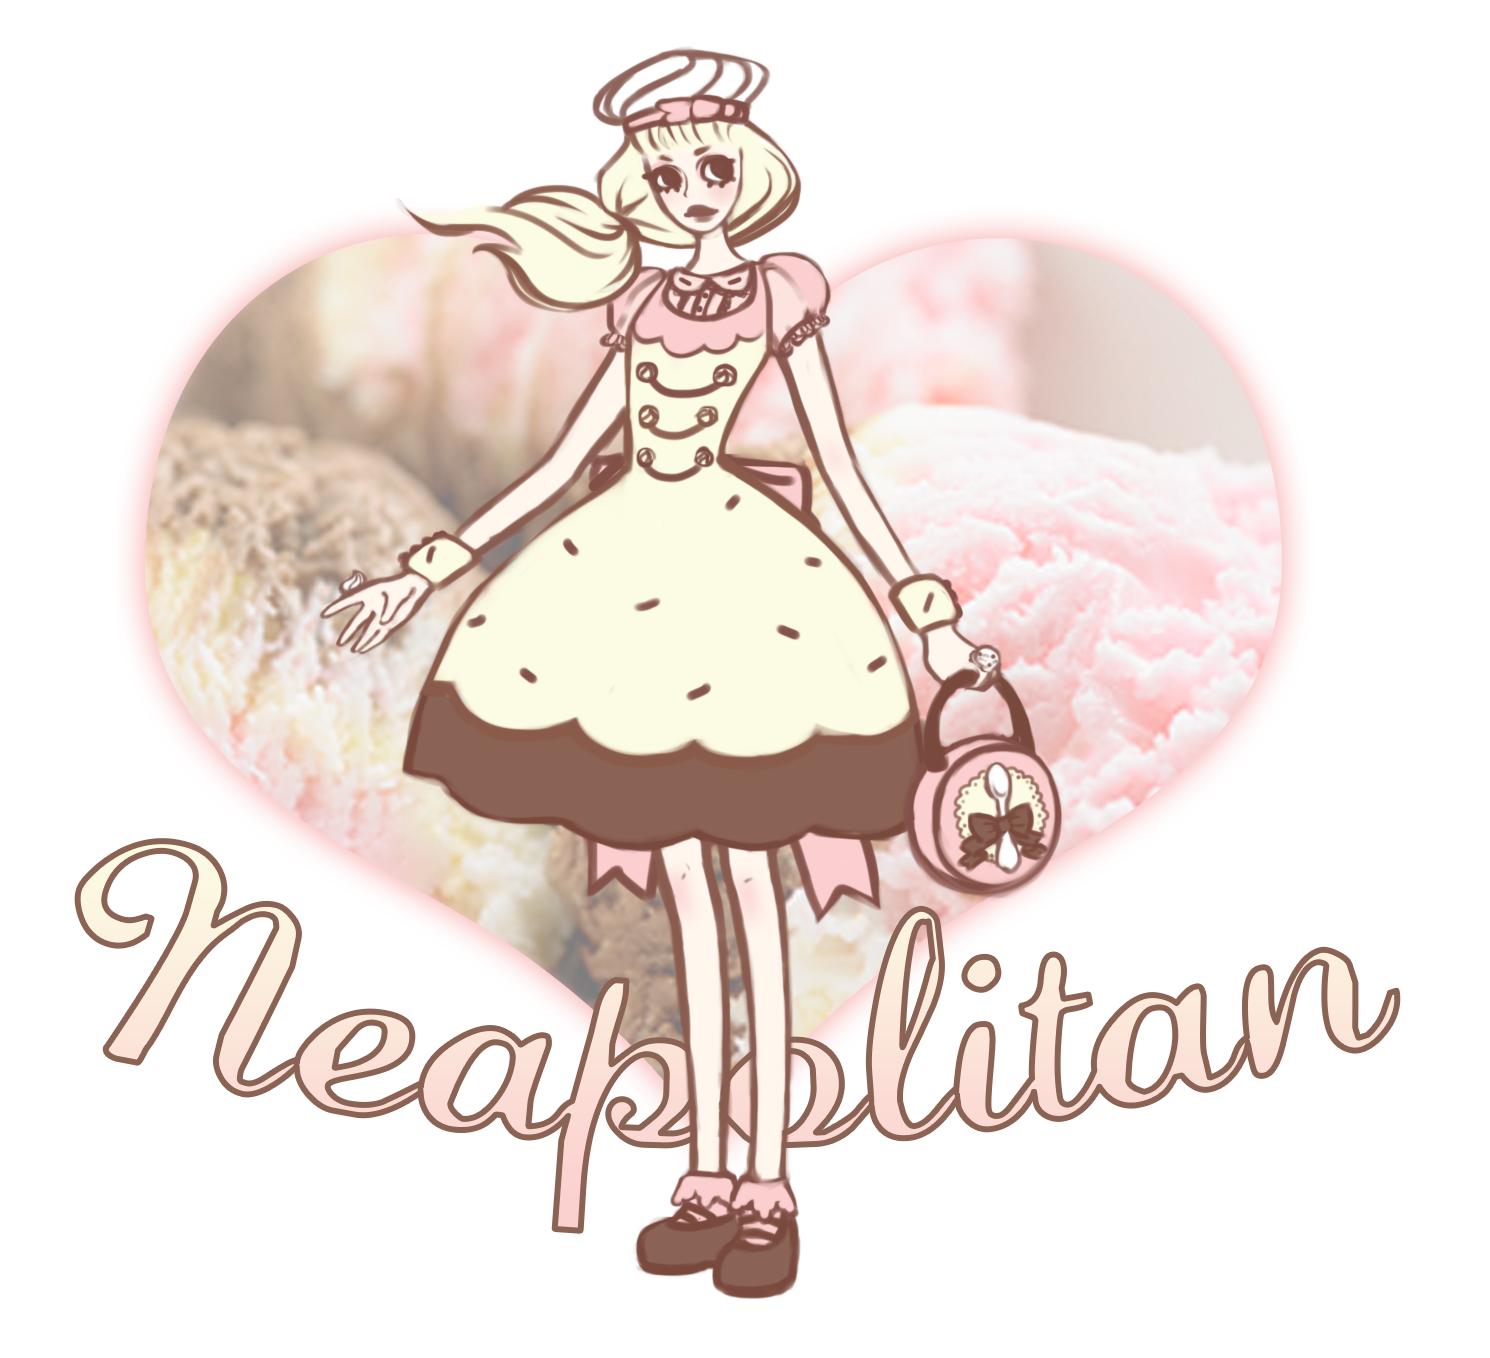 lolita, fashion, harajuku, classic, neapolitan, dessert, kawaii